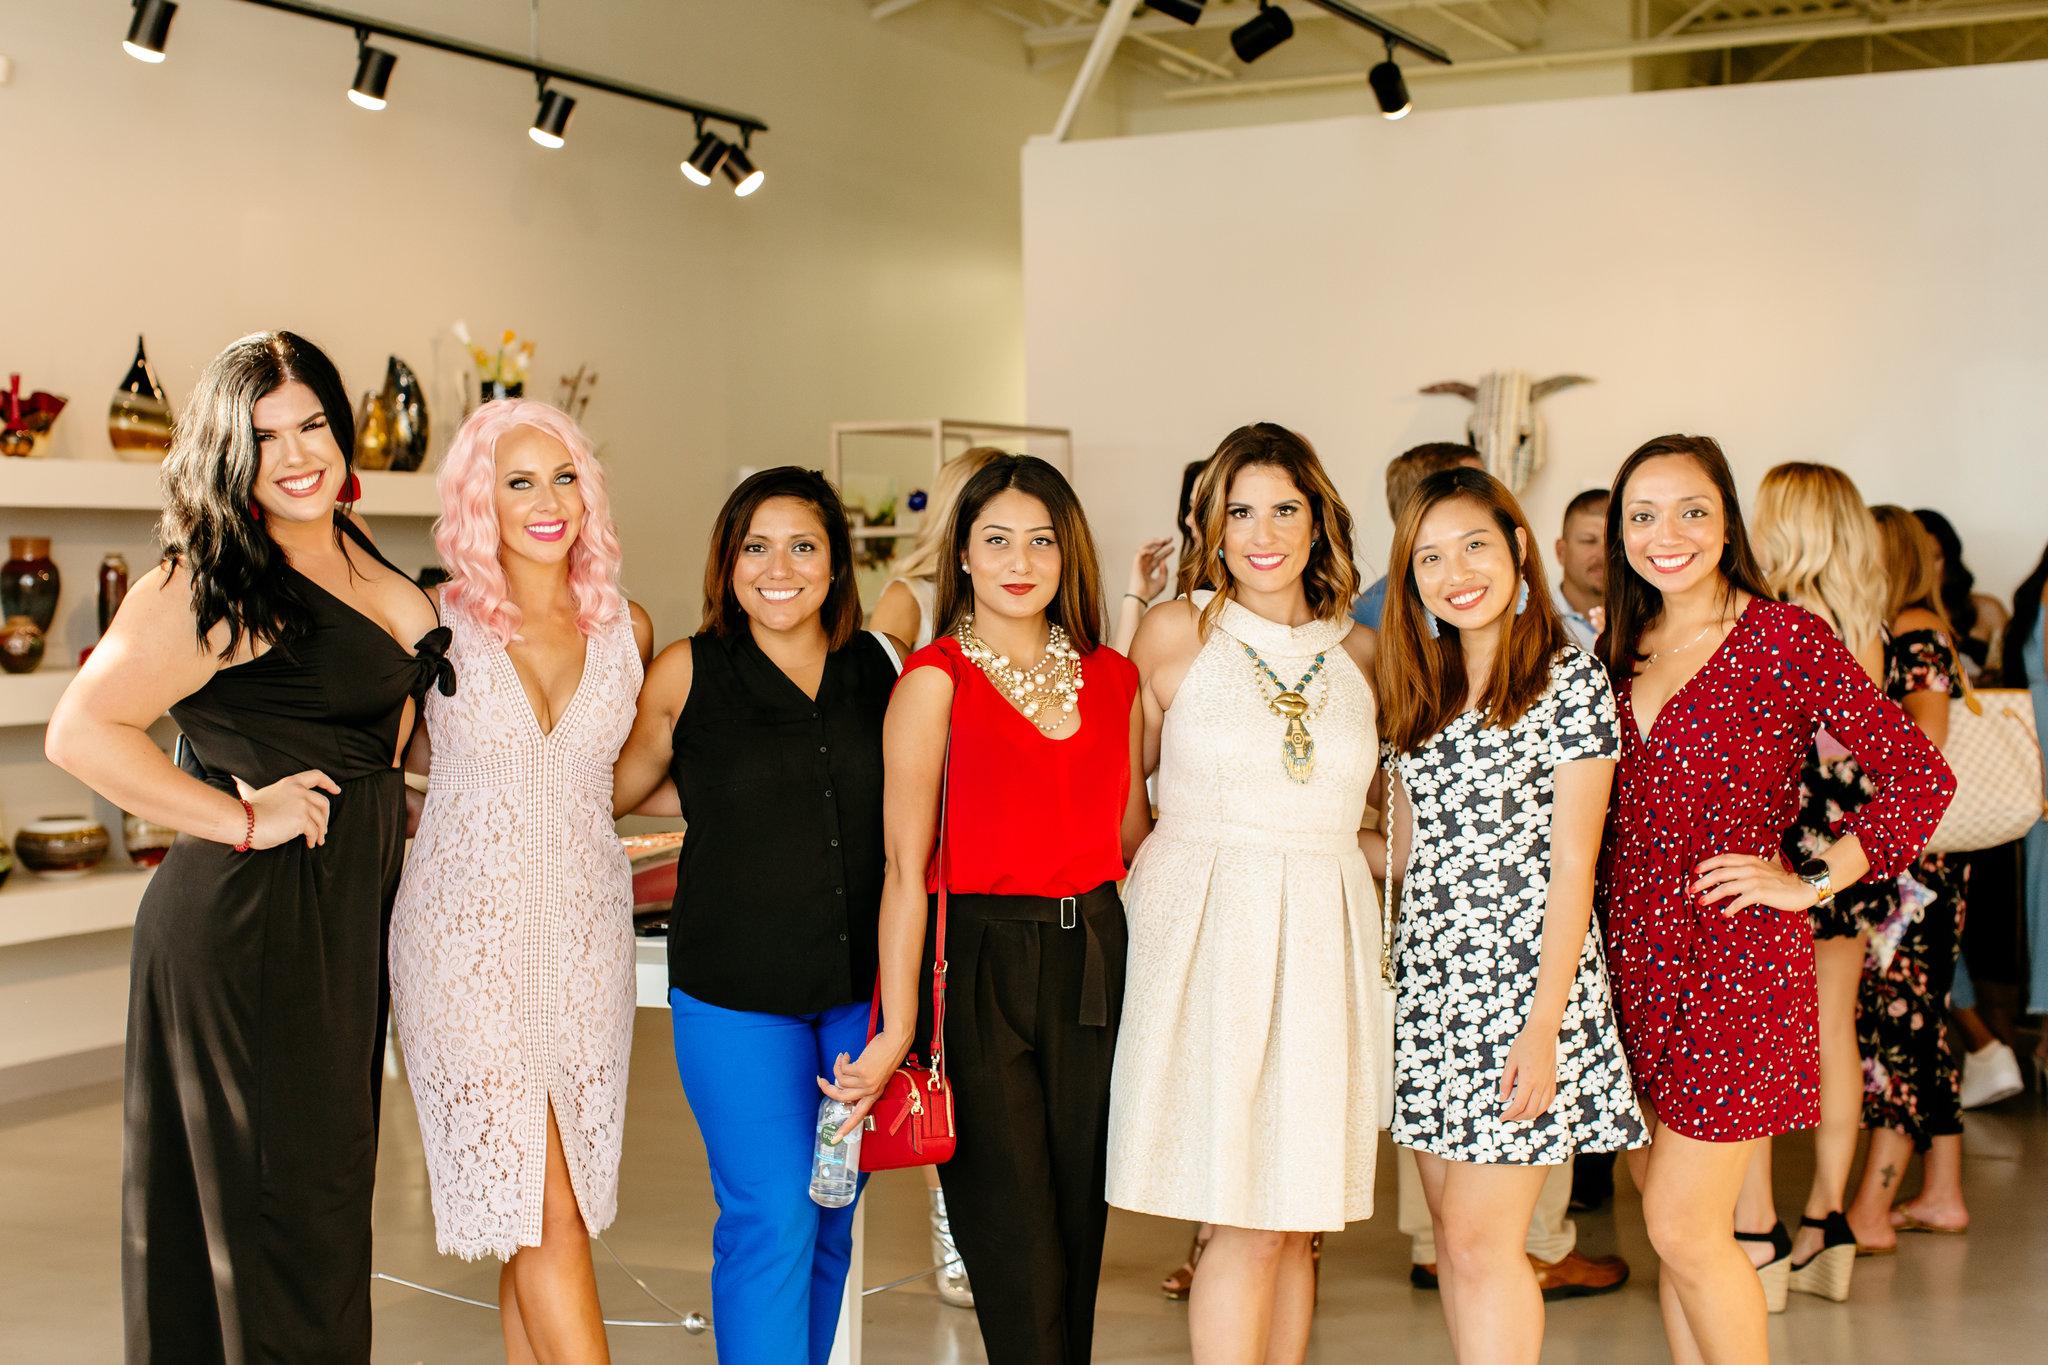 Alexa-Vossler-Photo_Dallas-Event-Photographer_Brite-Bar-Beauty-2018-Lipstick-Launch-Party-145.jpg